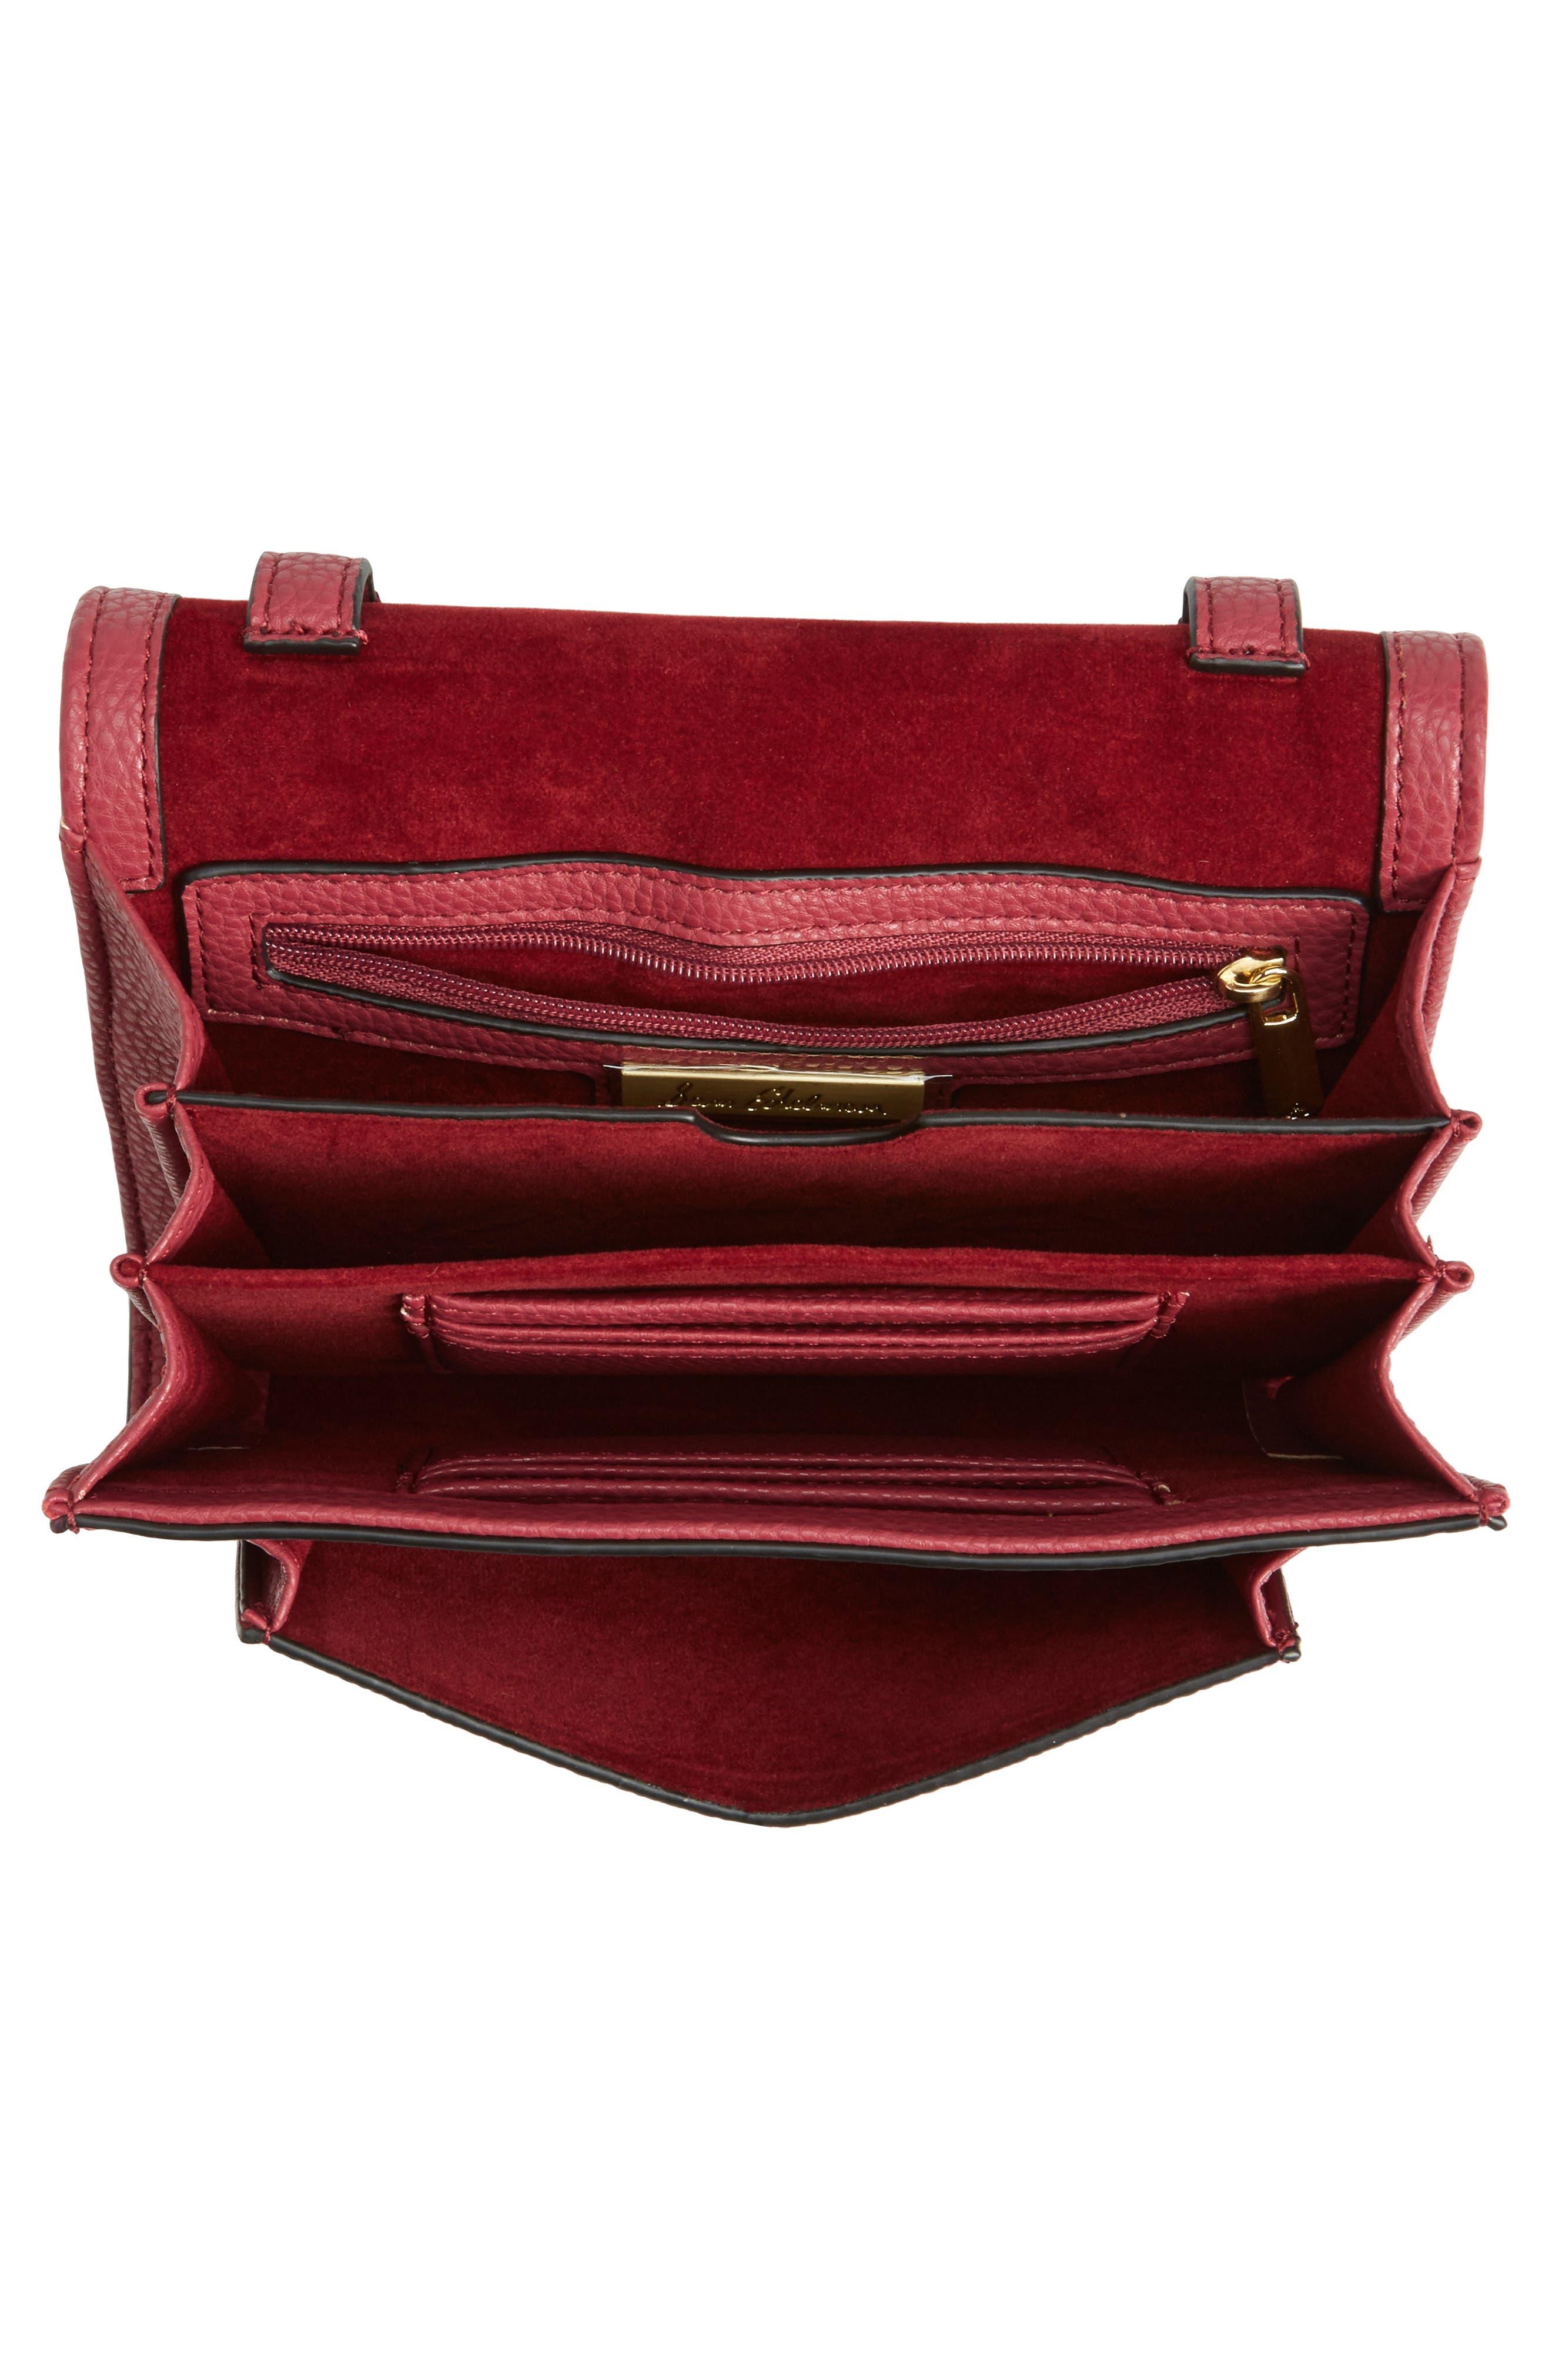 Florence Faux Leather Clutch Wallet,                             Alternate thumbnail 8, color,